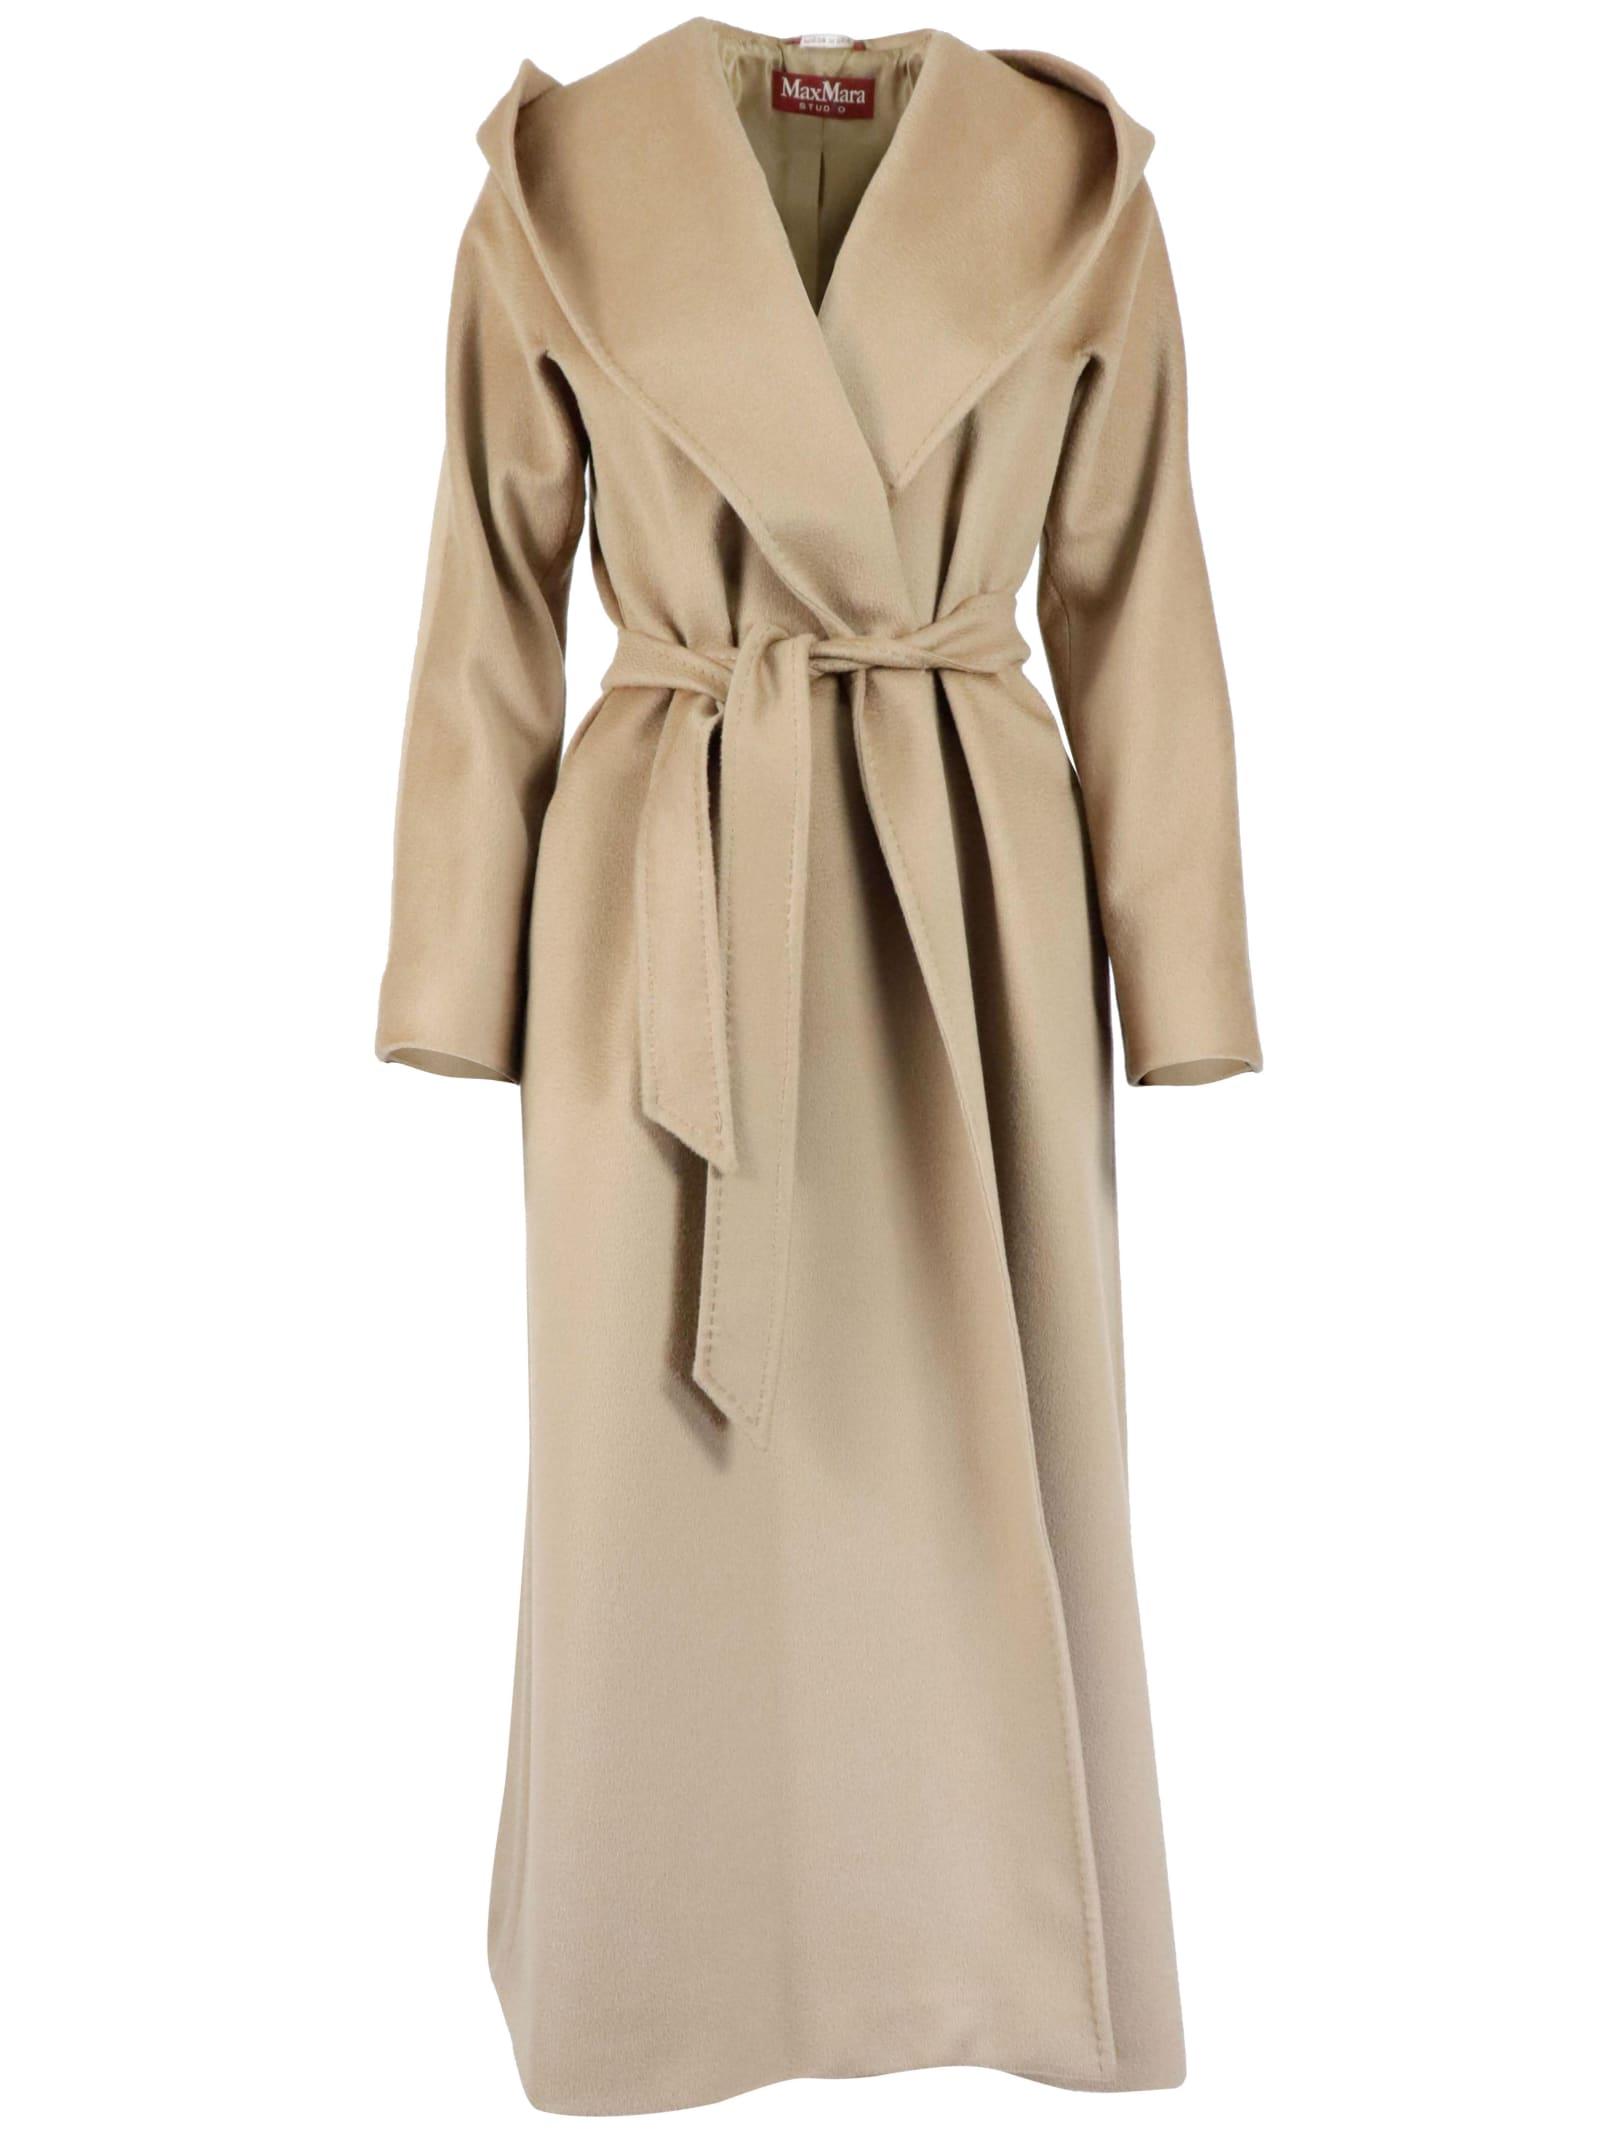 Max Mara Studio 3danton Coat